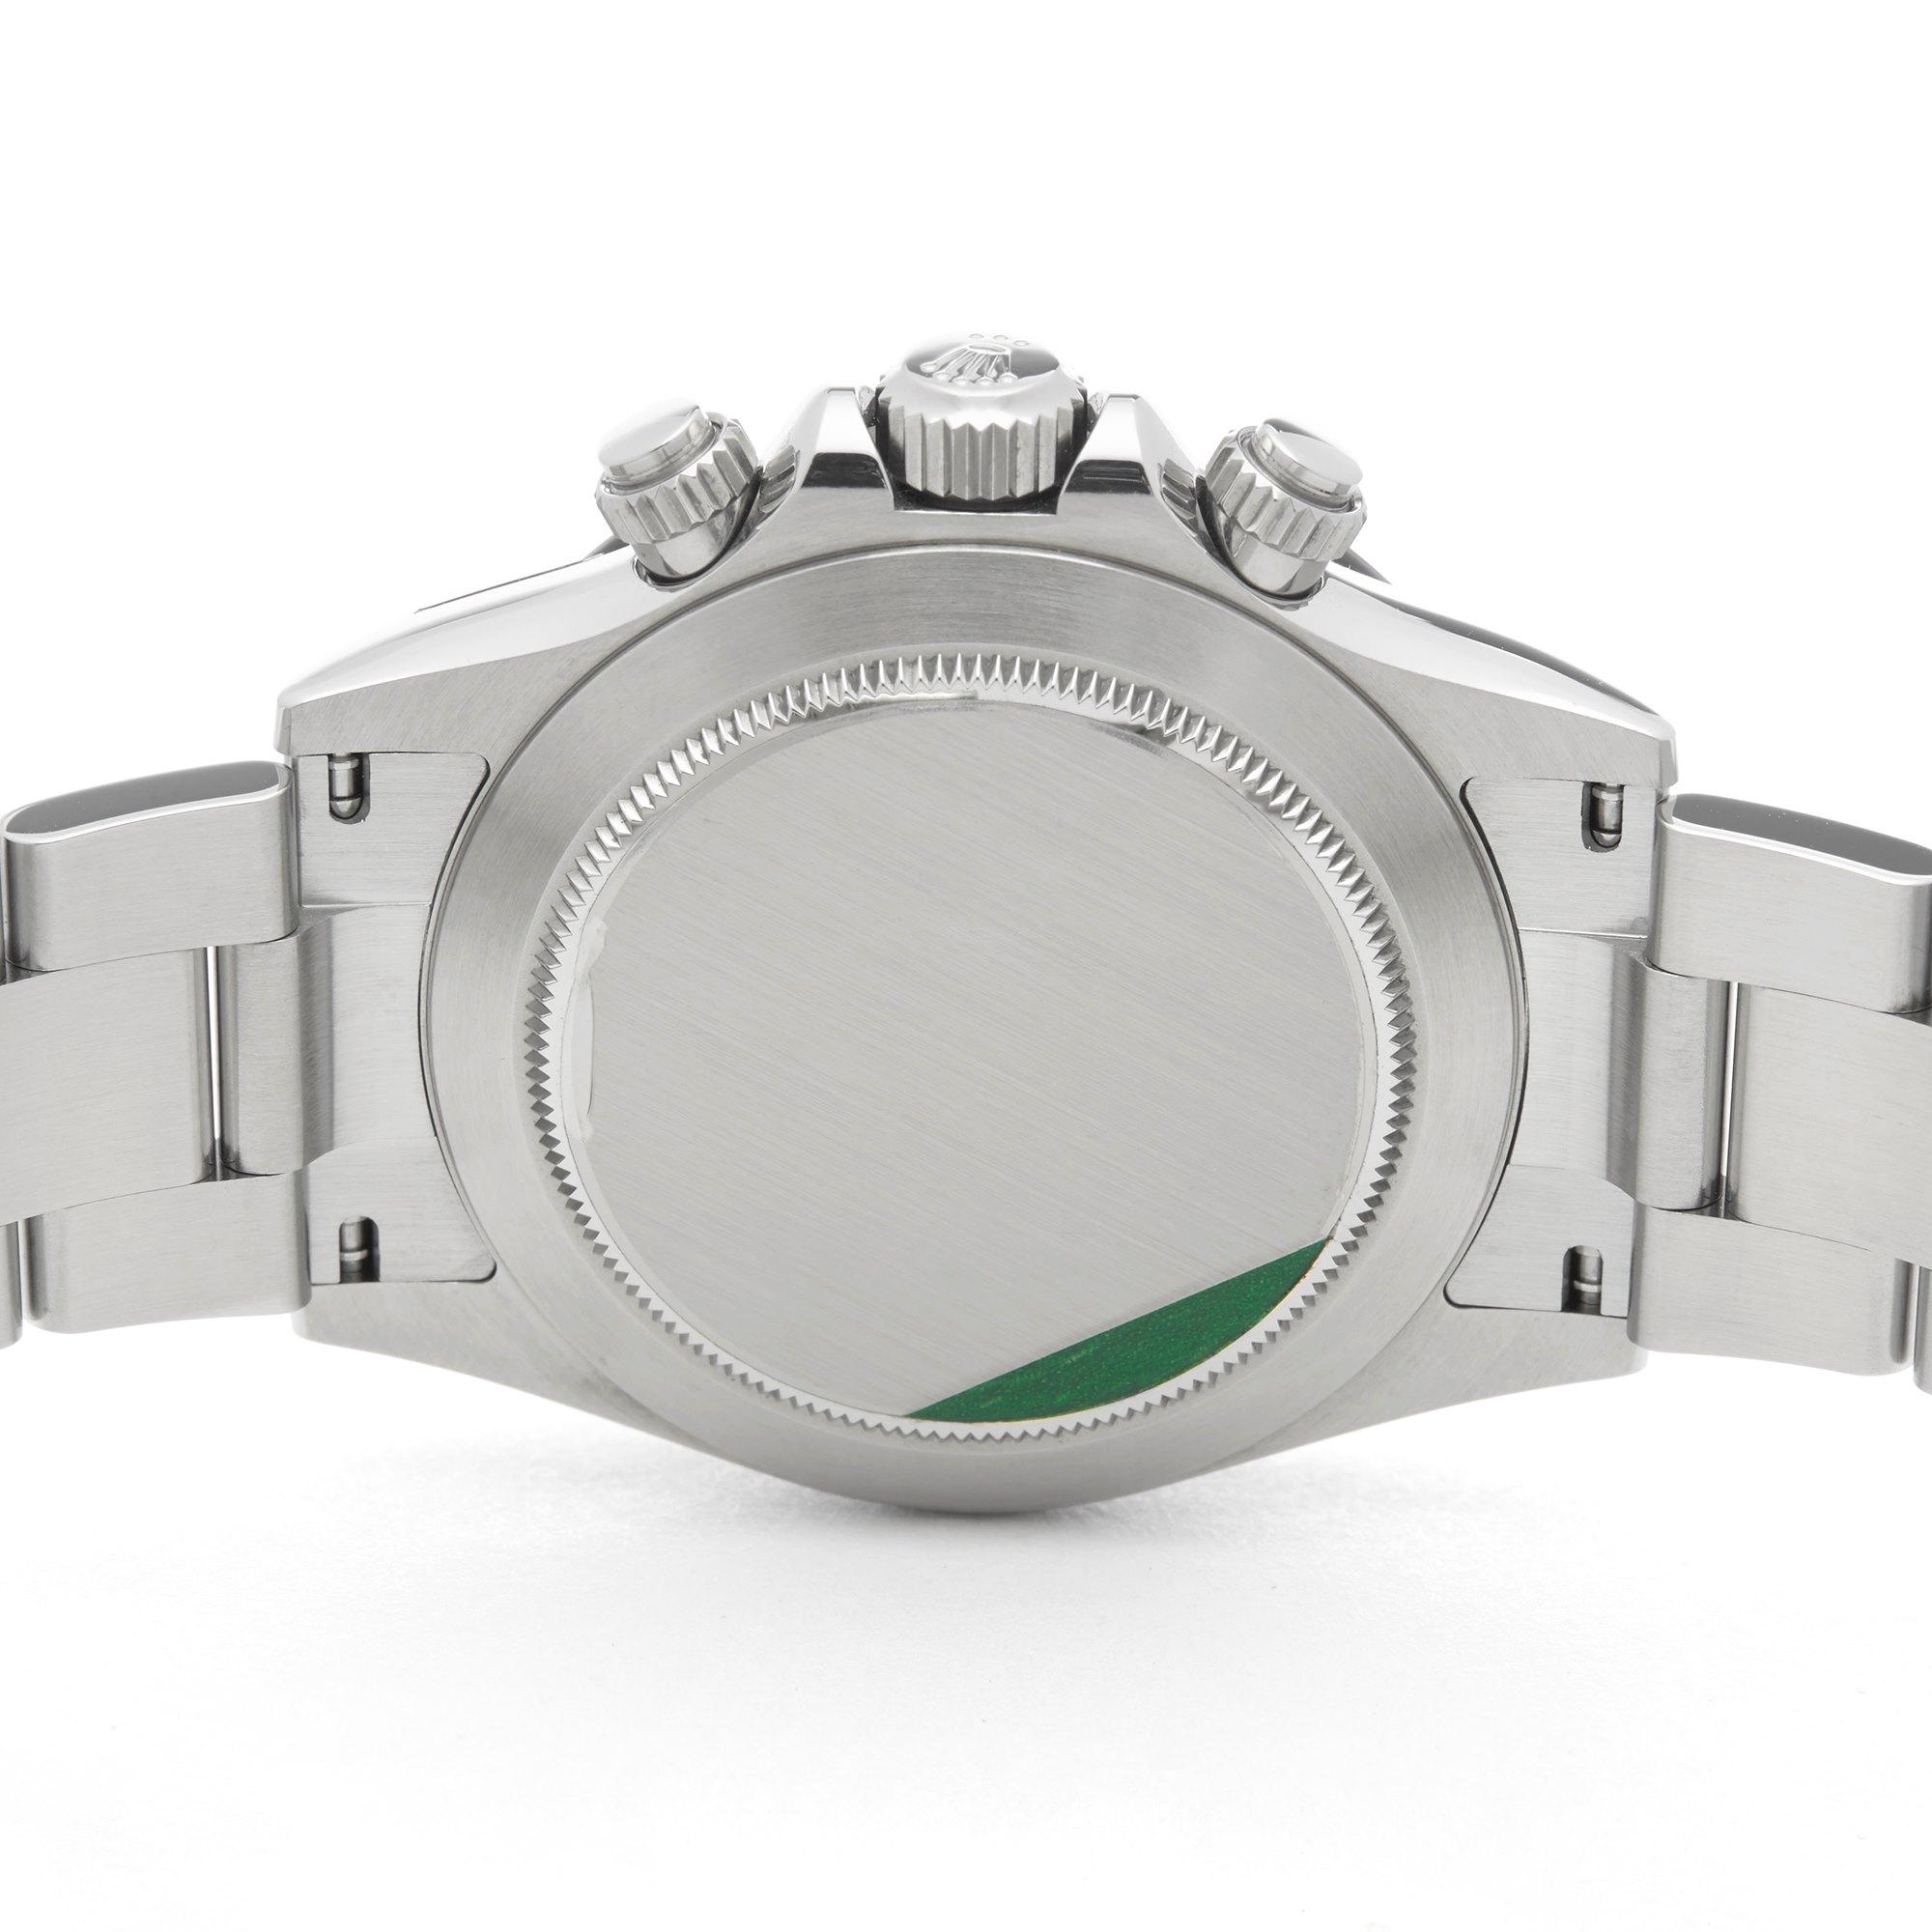 Rolex Daytona Chronograph Roestvrij Staal 116500LN